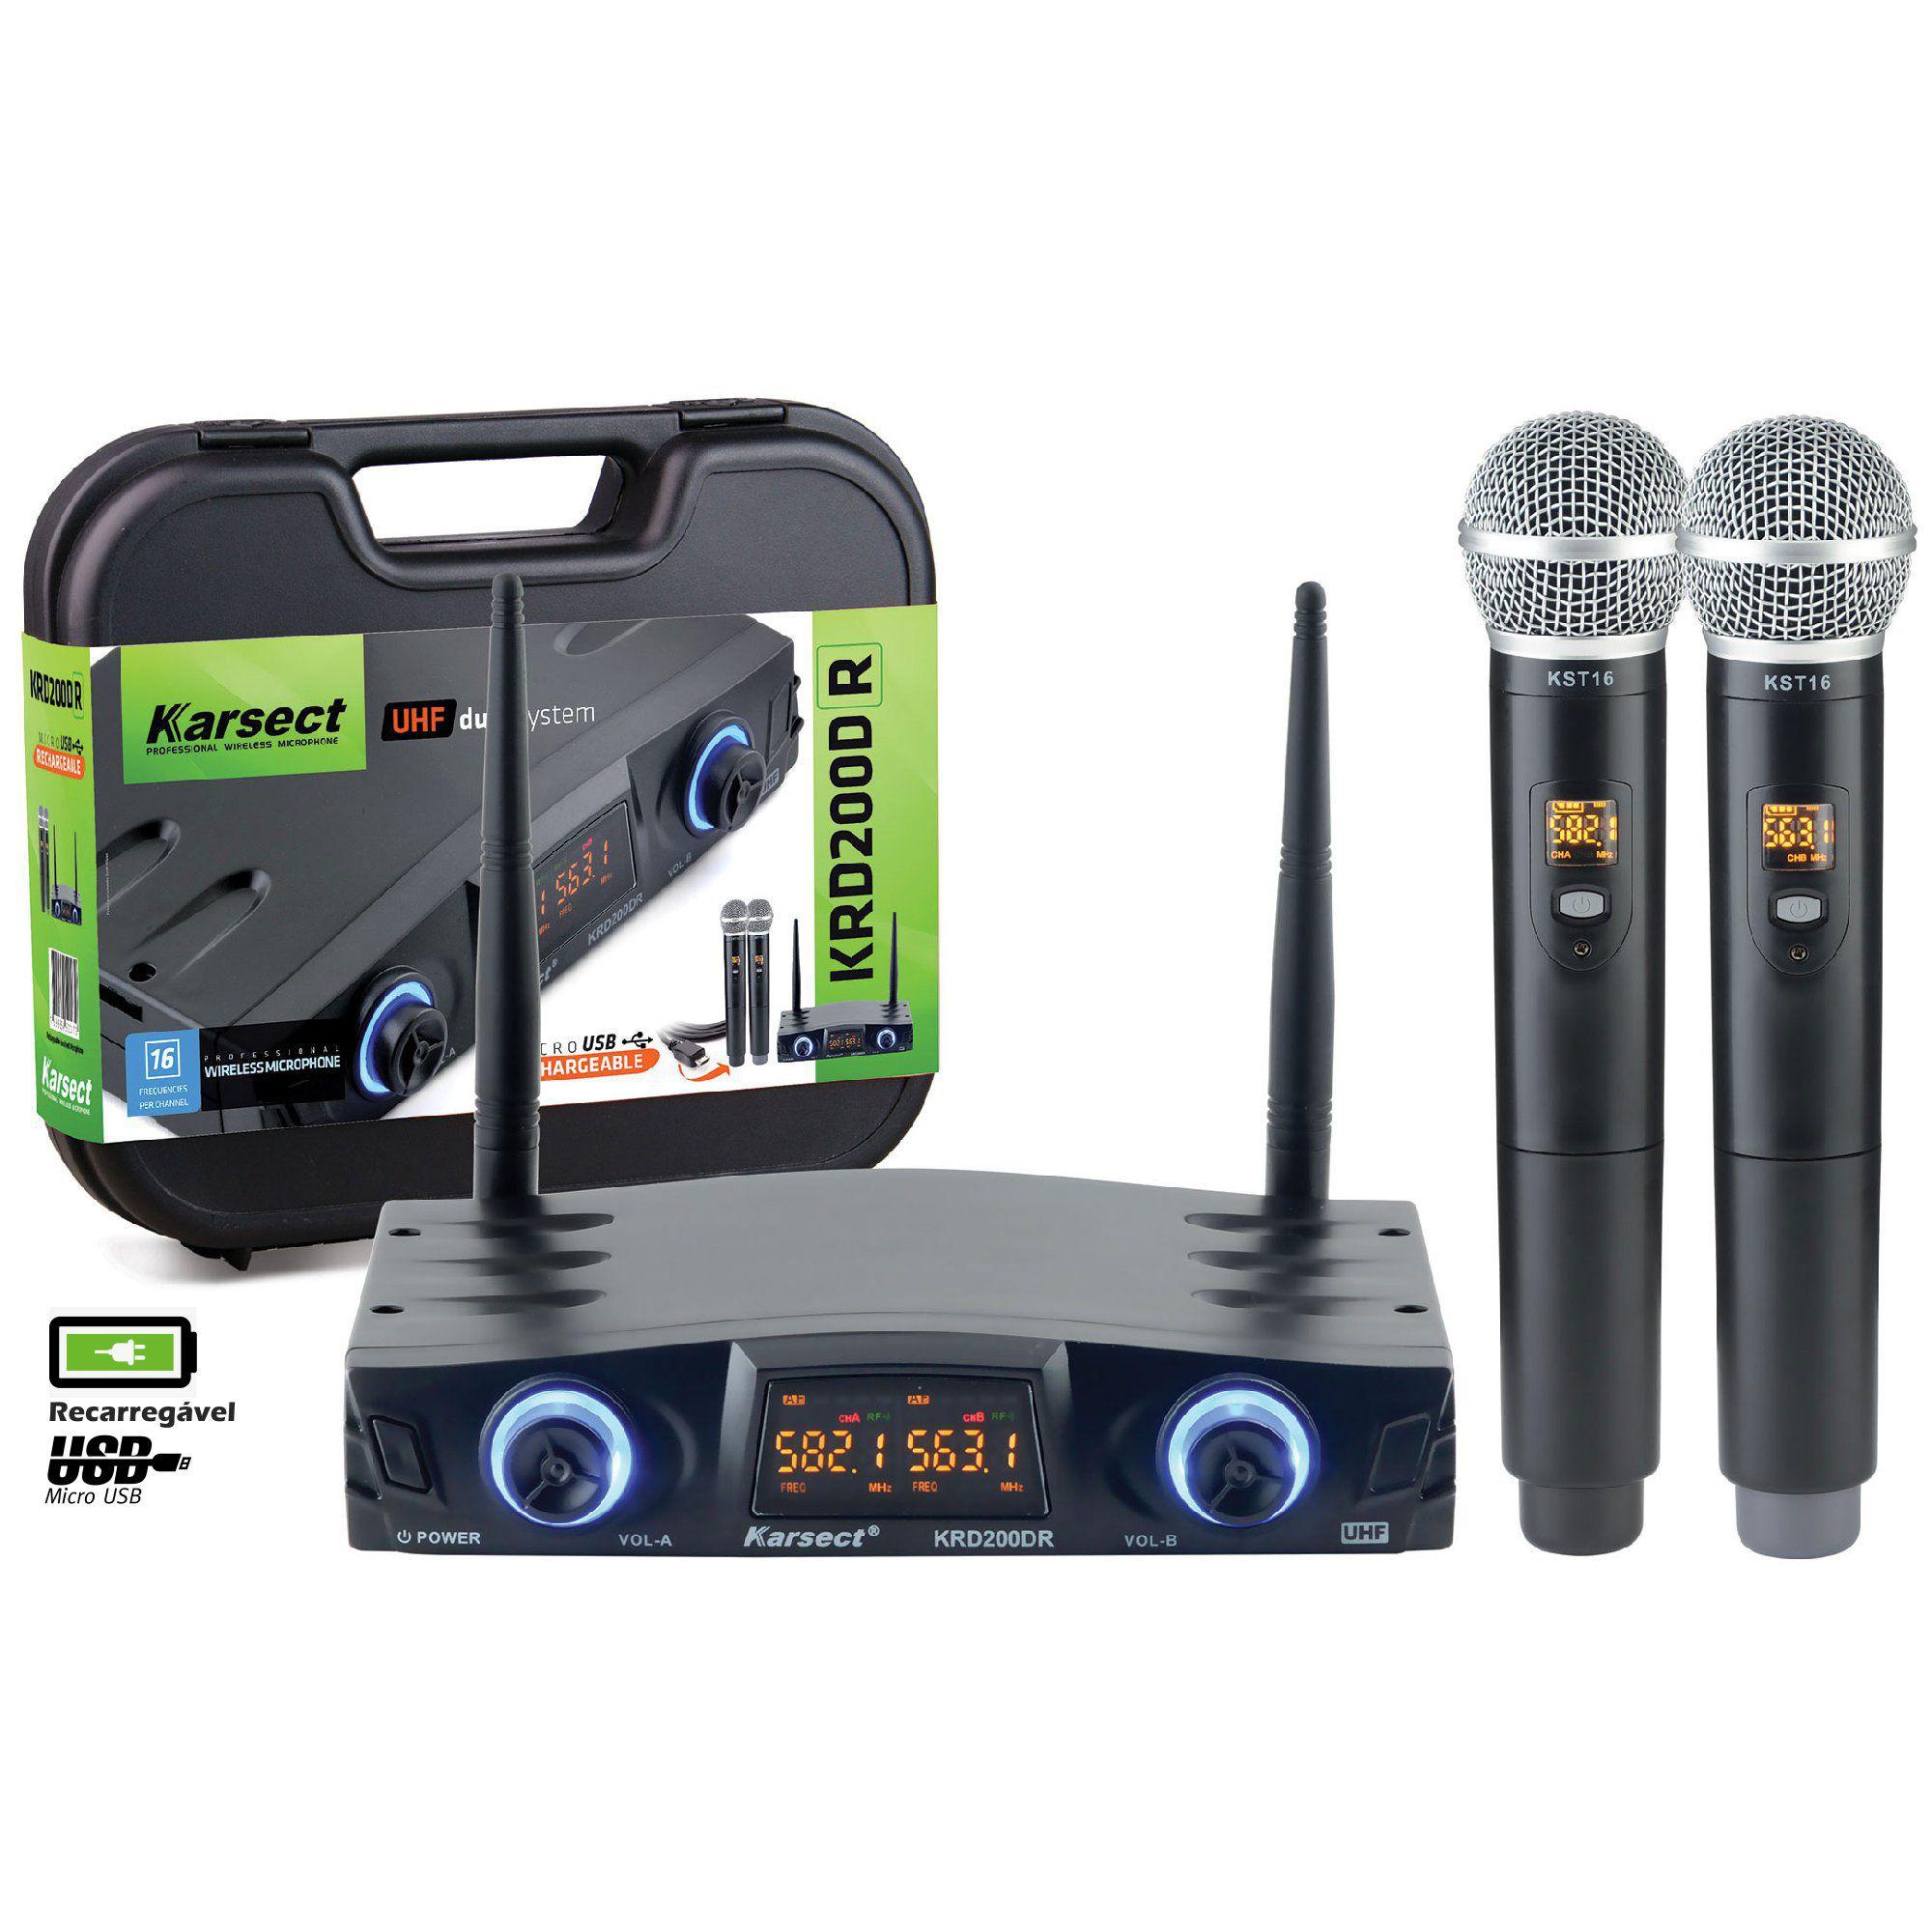 Microfone Karsect Sem Fio Krd200 Dr Bateria Recarregavel